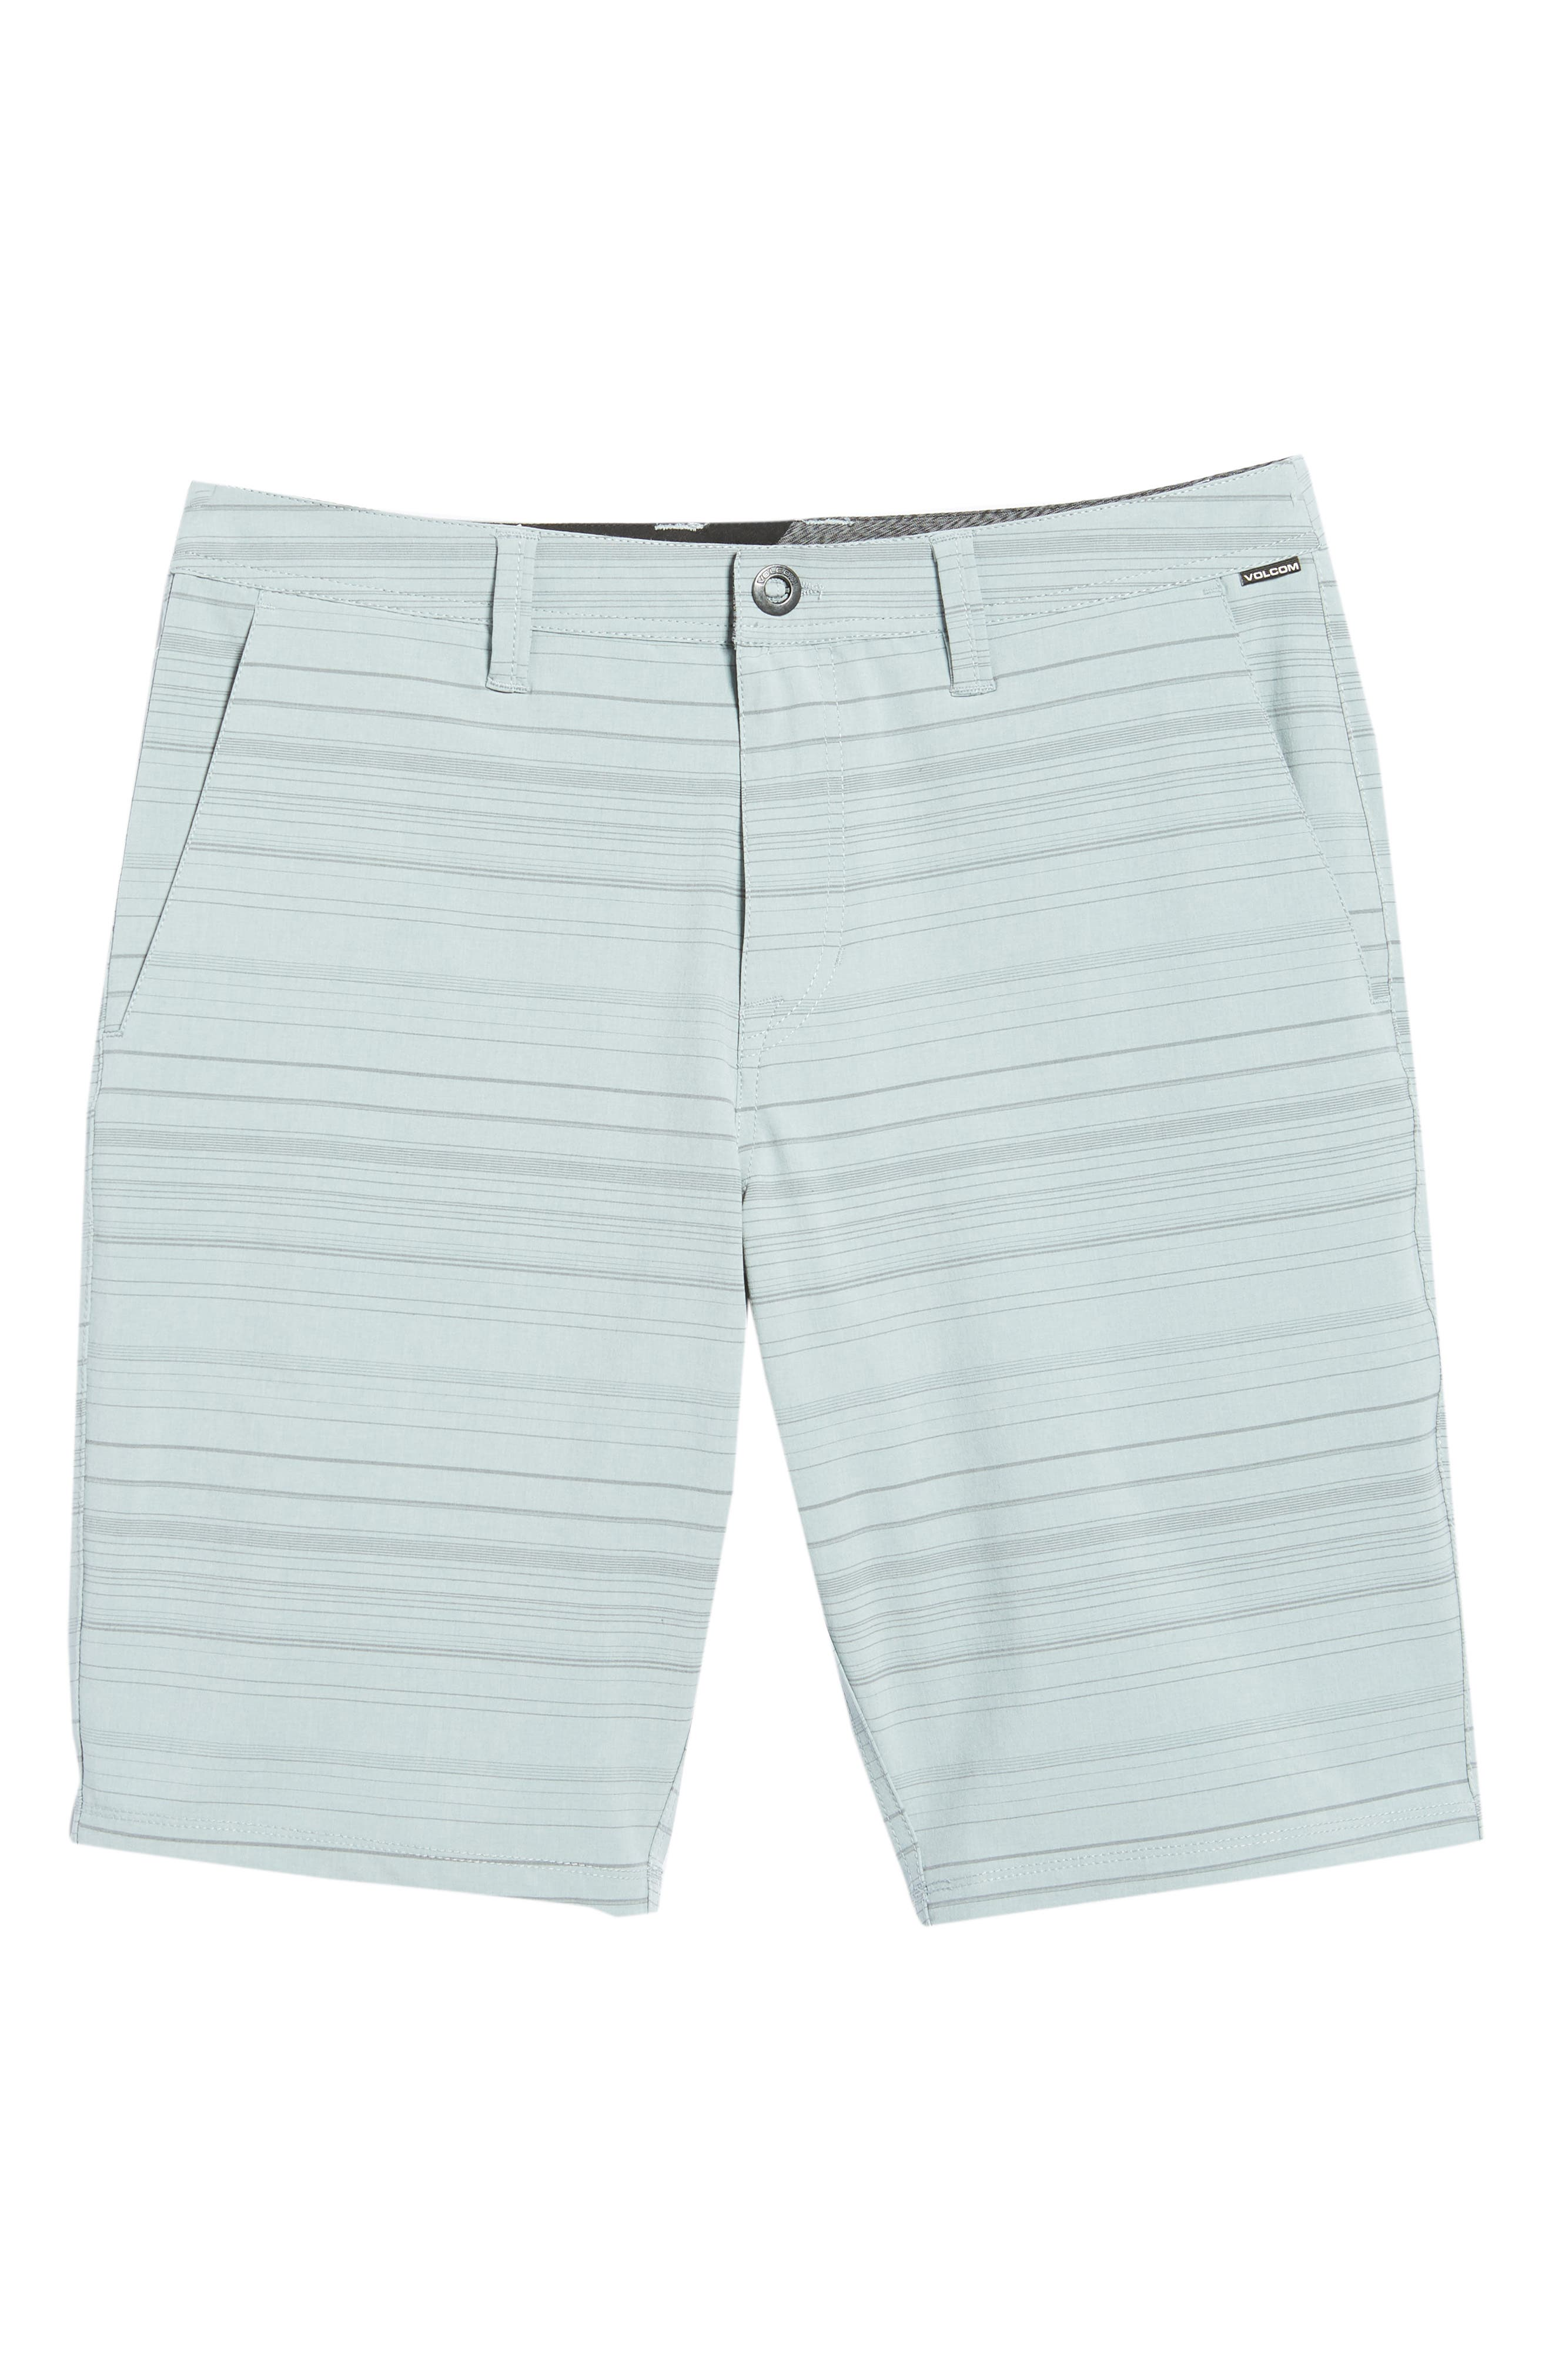 Surf N' Turf Mix Hybrid Shorts,                             Alternate thumbnail 31, color,